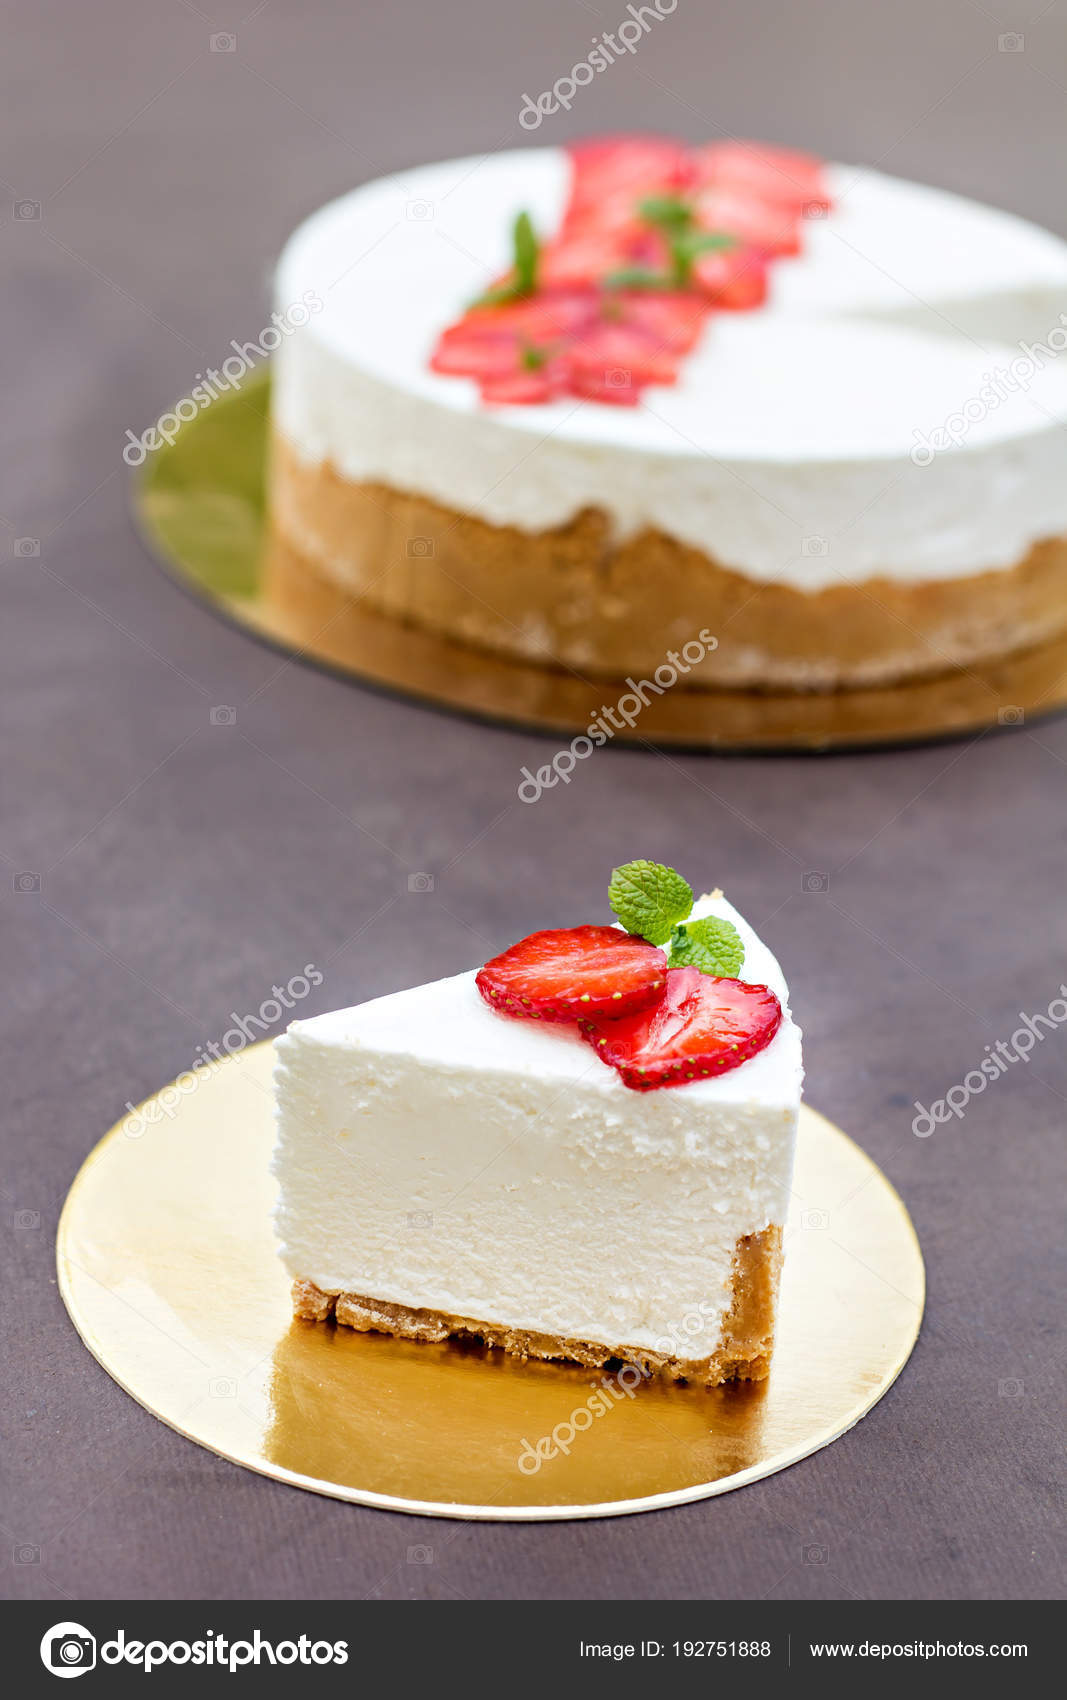 Tarta De Queso Con Fresas Pastel Decorado Con Fresas Fotos De